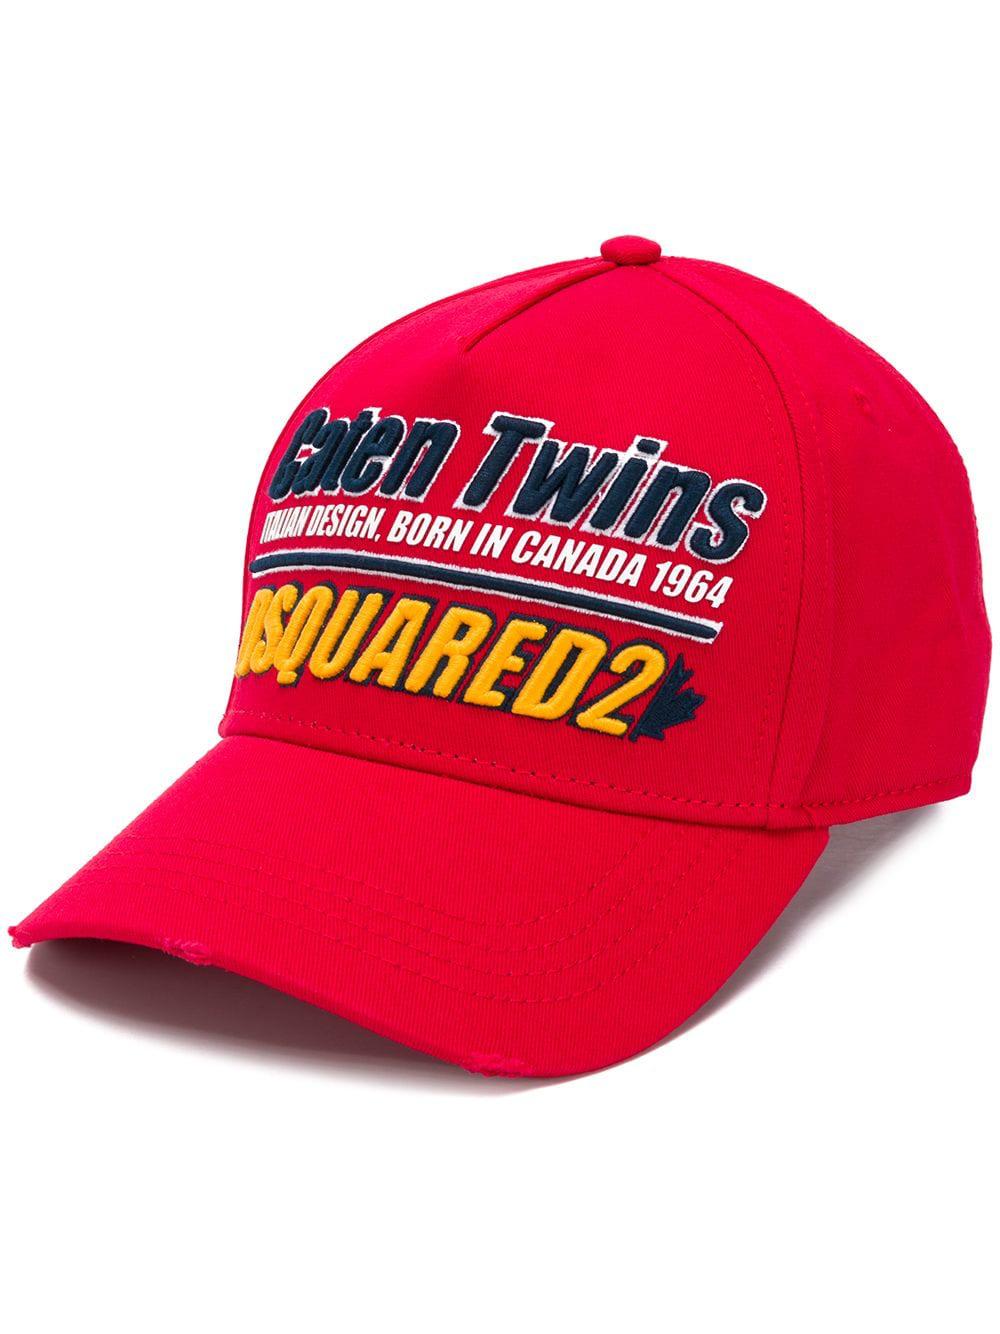 eb6b5d8b1 Dsquared2 Caten Twins Logo Baseball Cap In Red | ModeSens